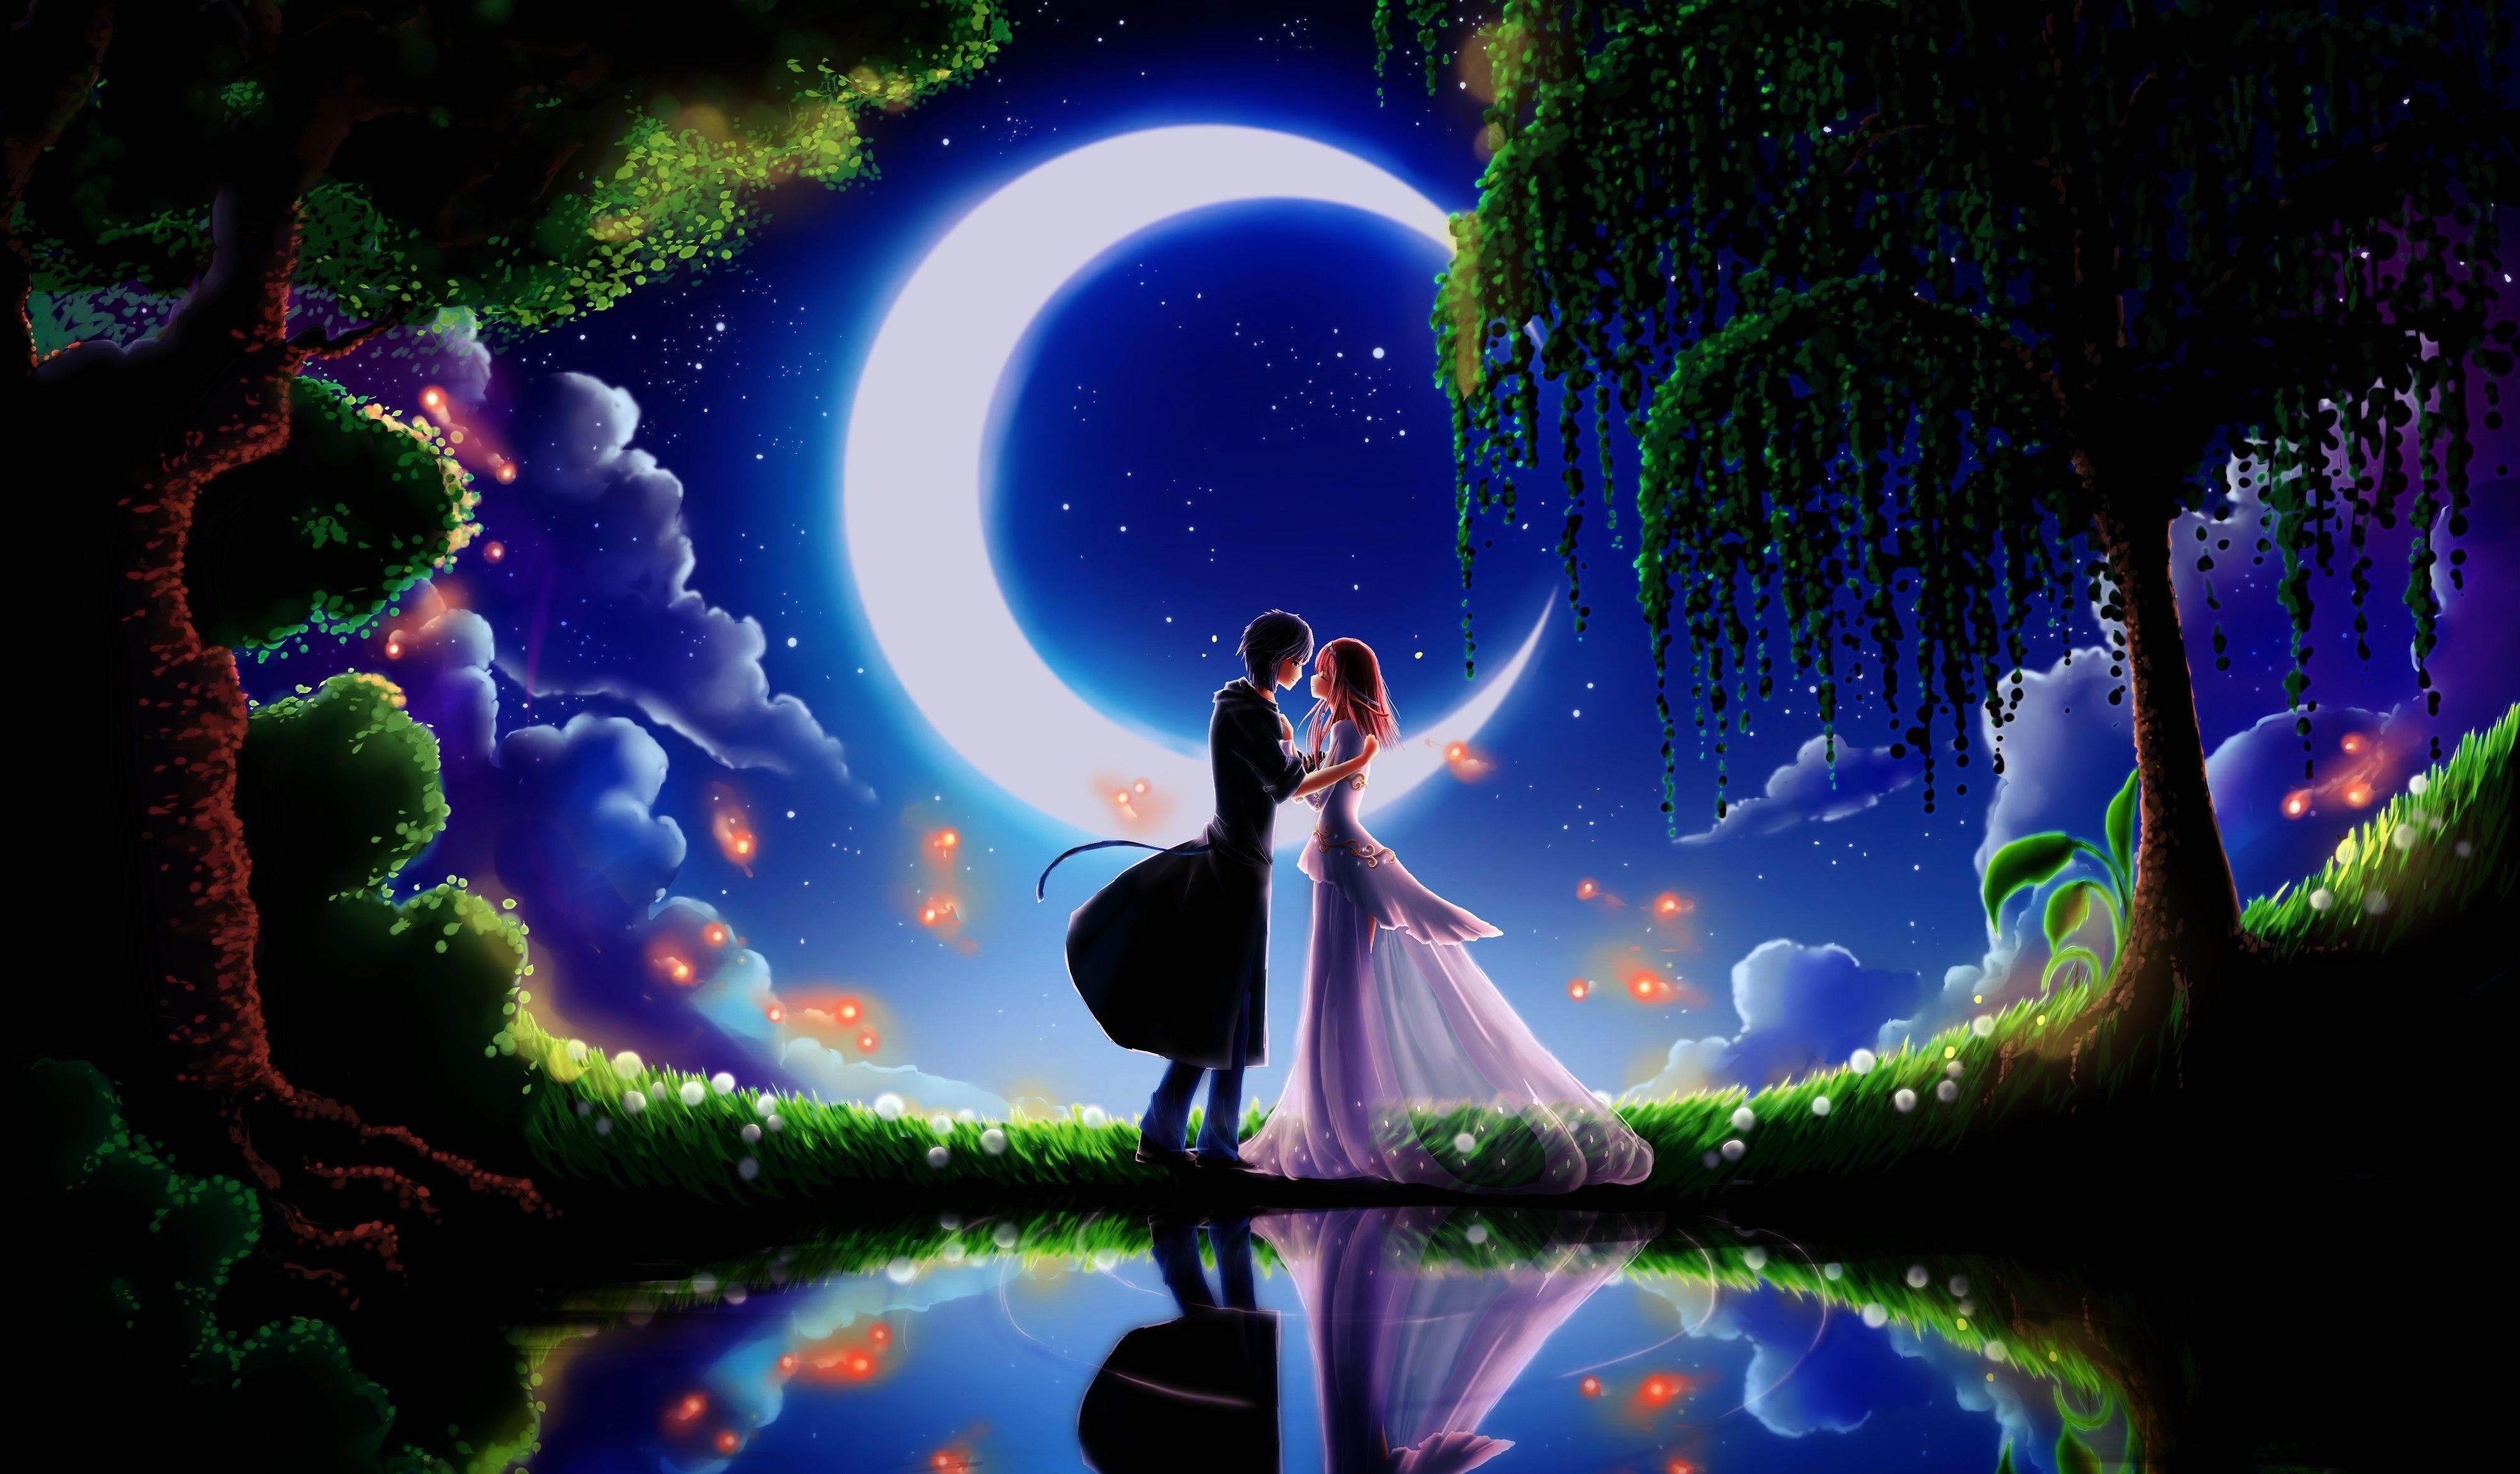 Beautiful Anime Couple In Moonlight Anime Wallpaper Anime Background Love Wallpaper